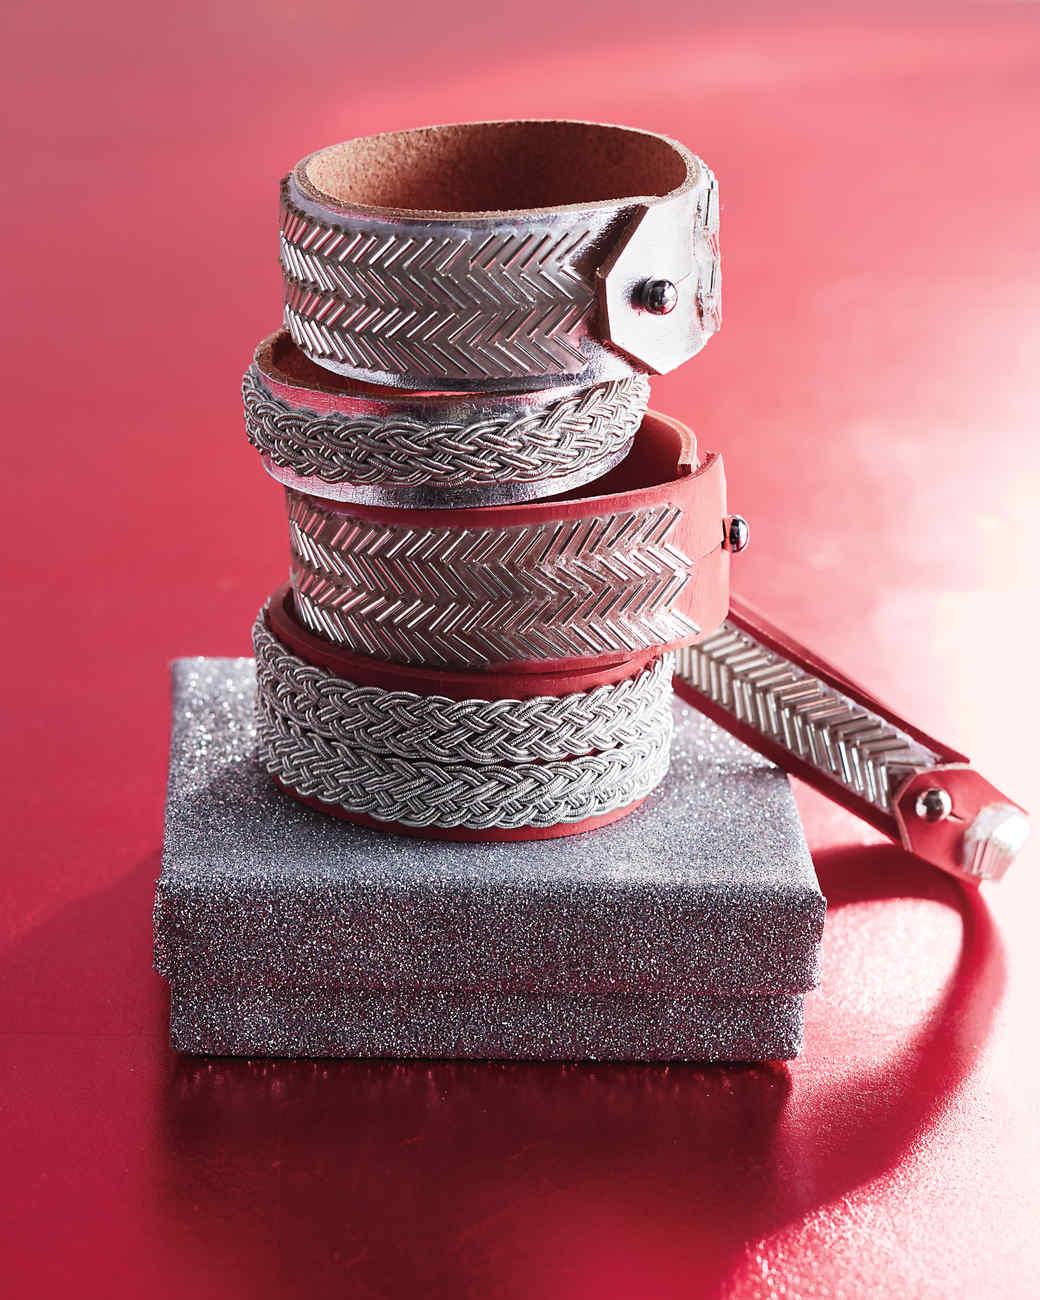 silver-leather-bracelets-0288-d112411.jpg